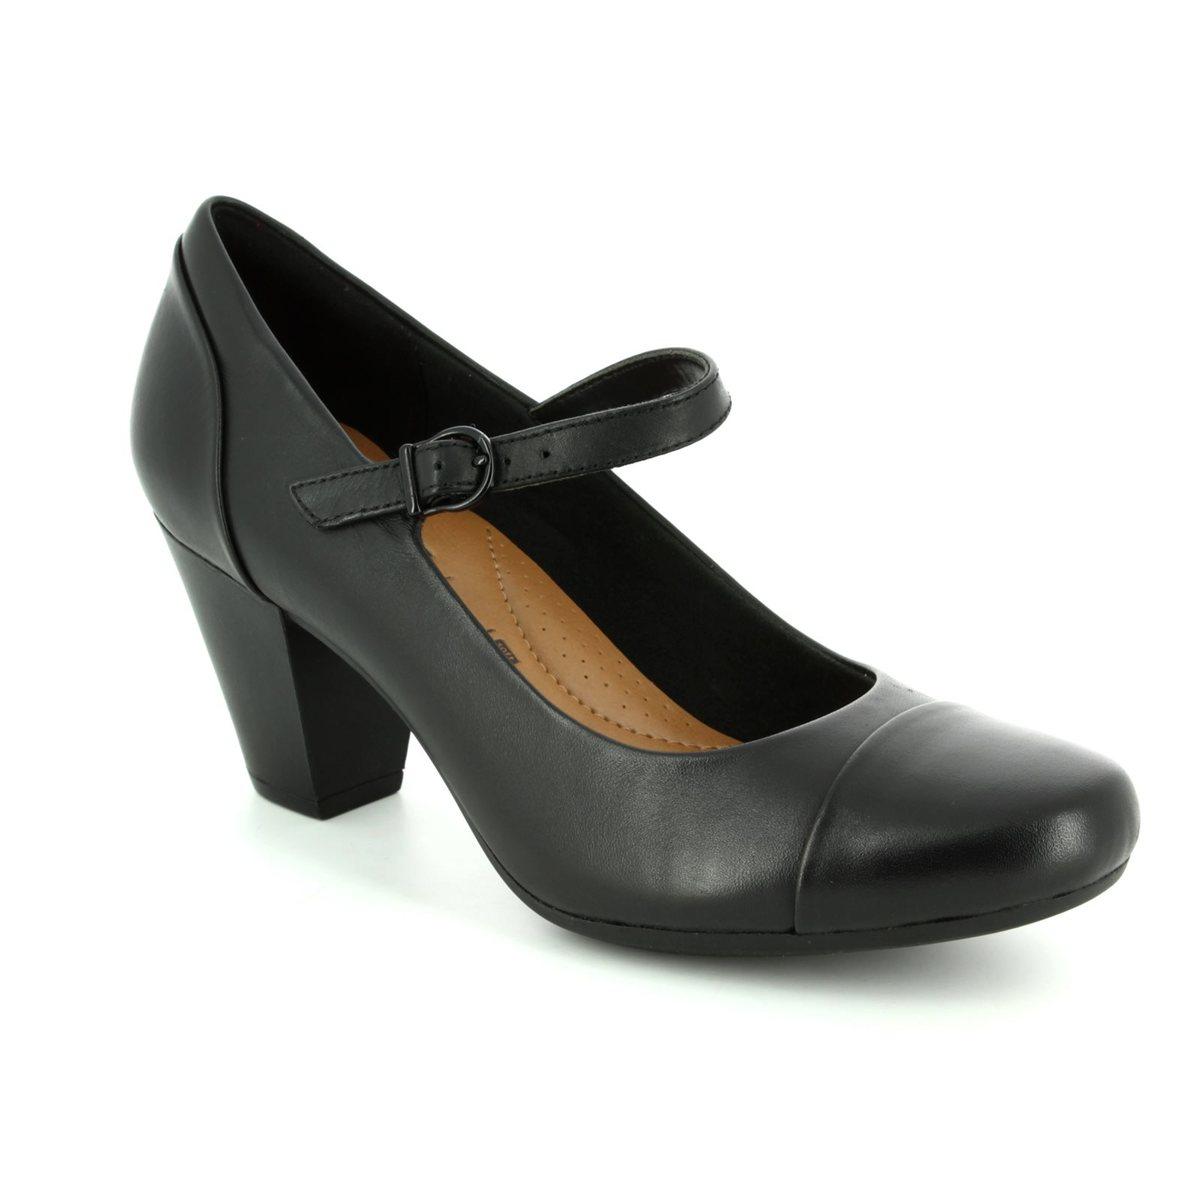 c9c5de9a522 Clarks Heeled Shoes - Black - 2884 54D GARNIT TIANNA